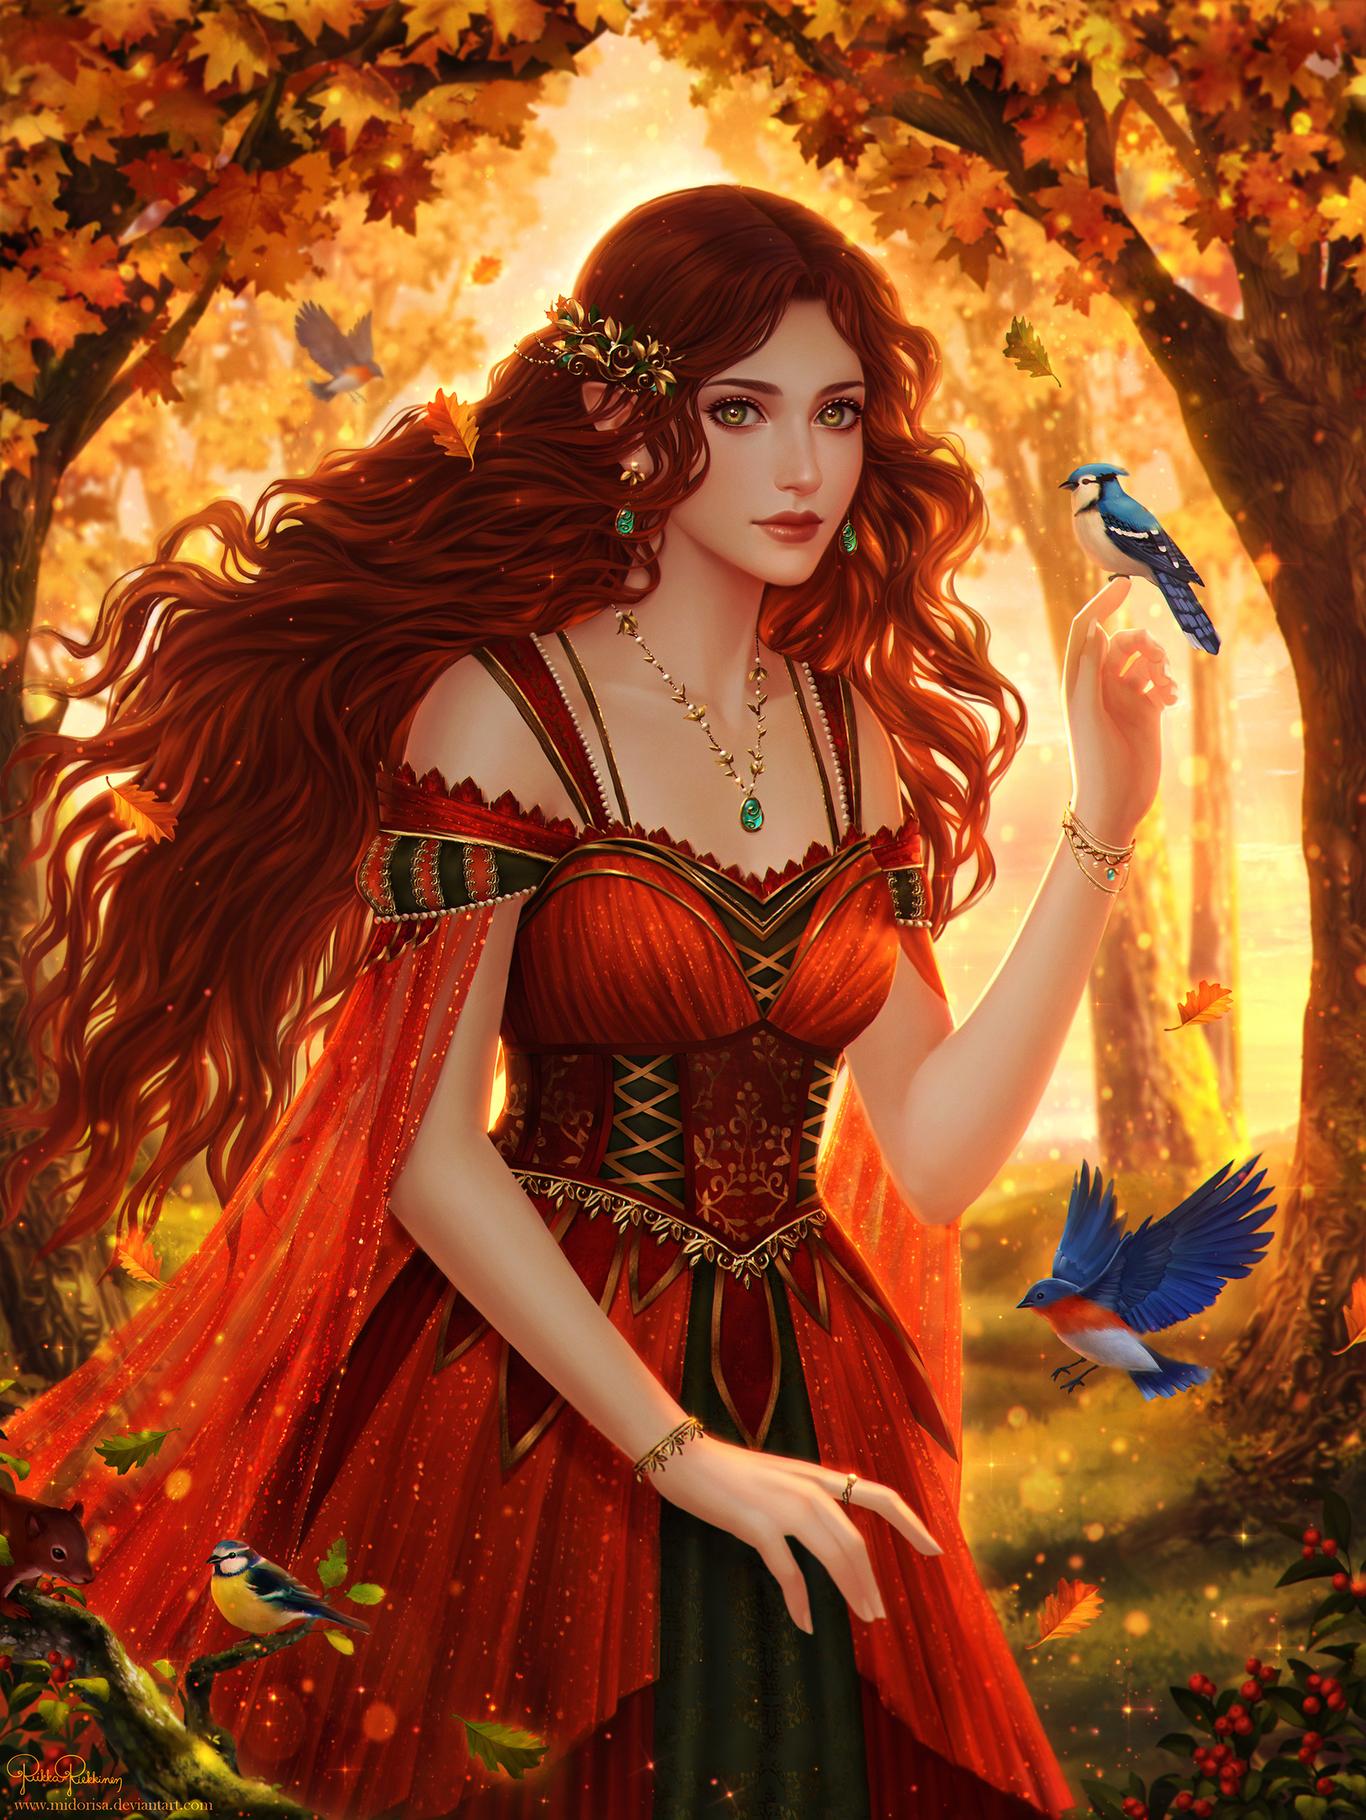 Midorisa autumn fairy 1 bfaae793 gvcj